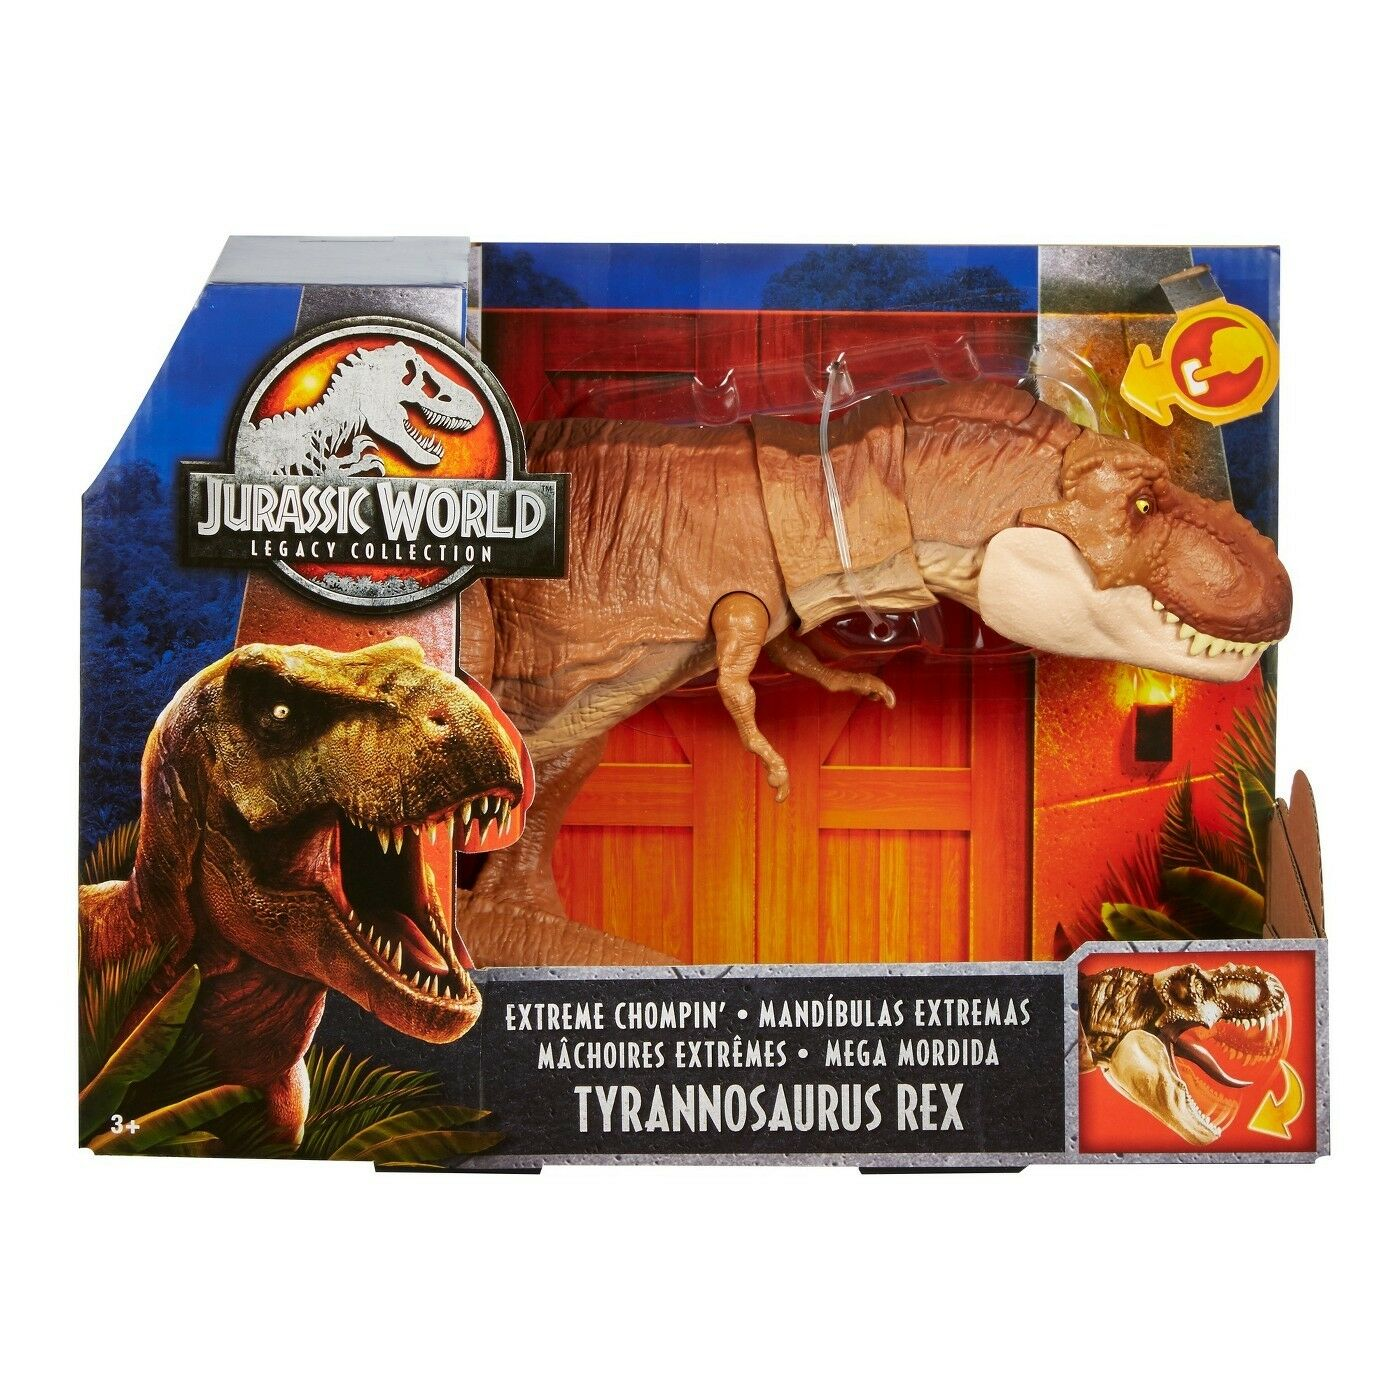 Jurassic World Legacy collezione Extreme Chompin' Tyrannosaurus Rex nuovo